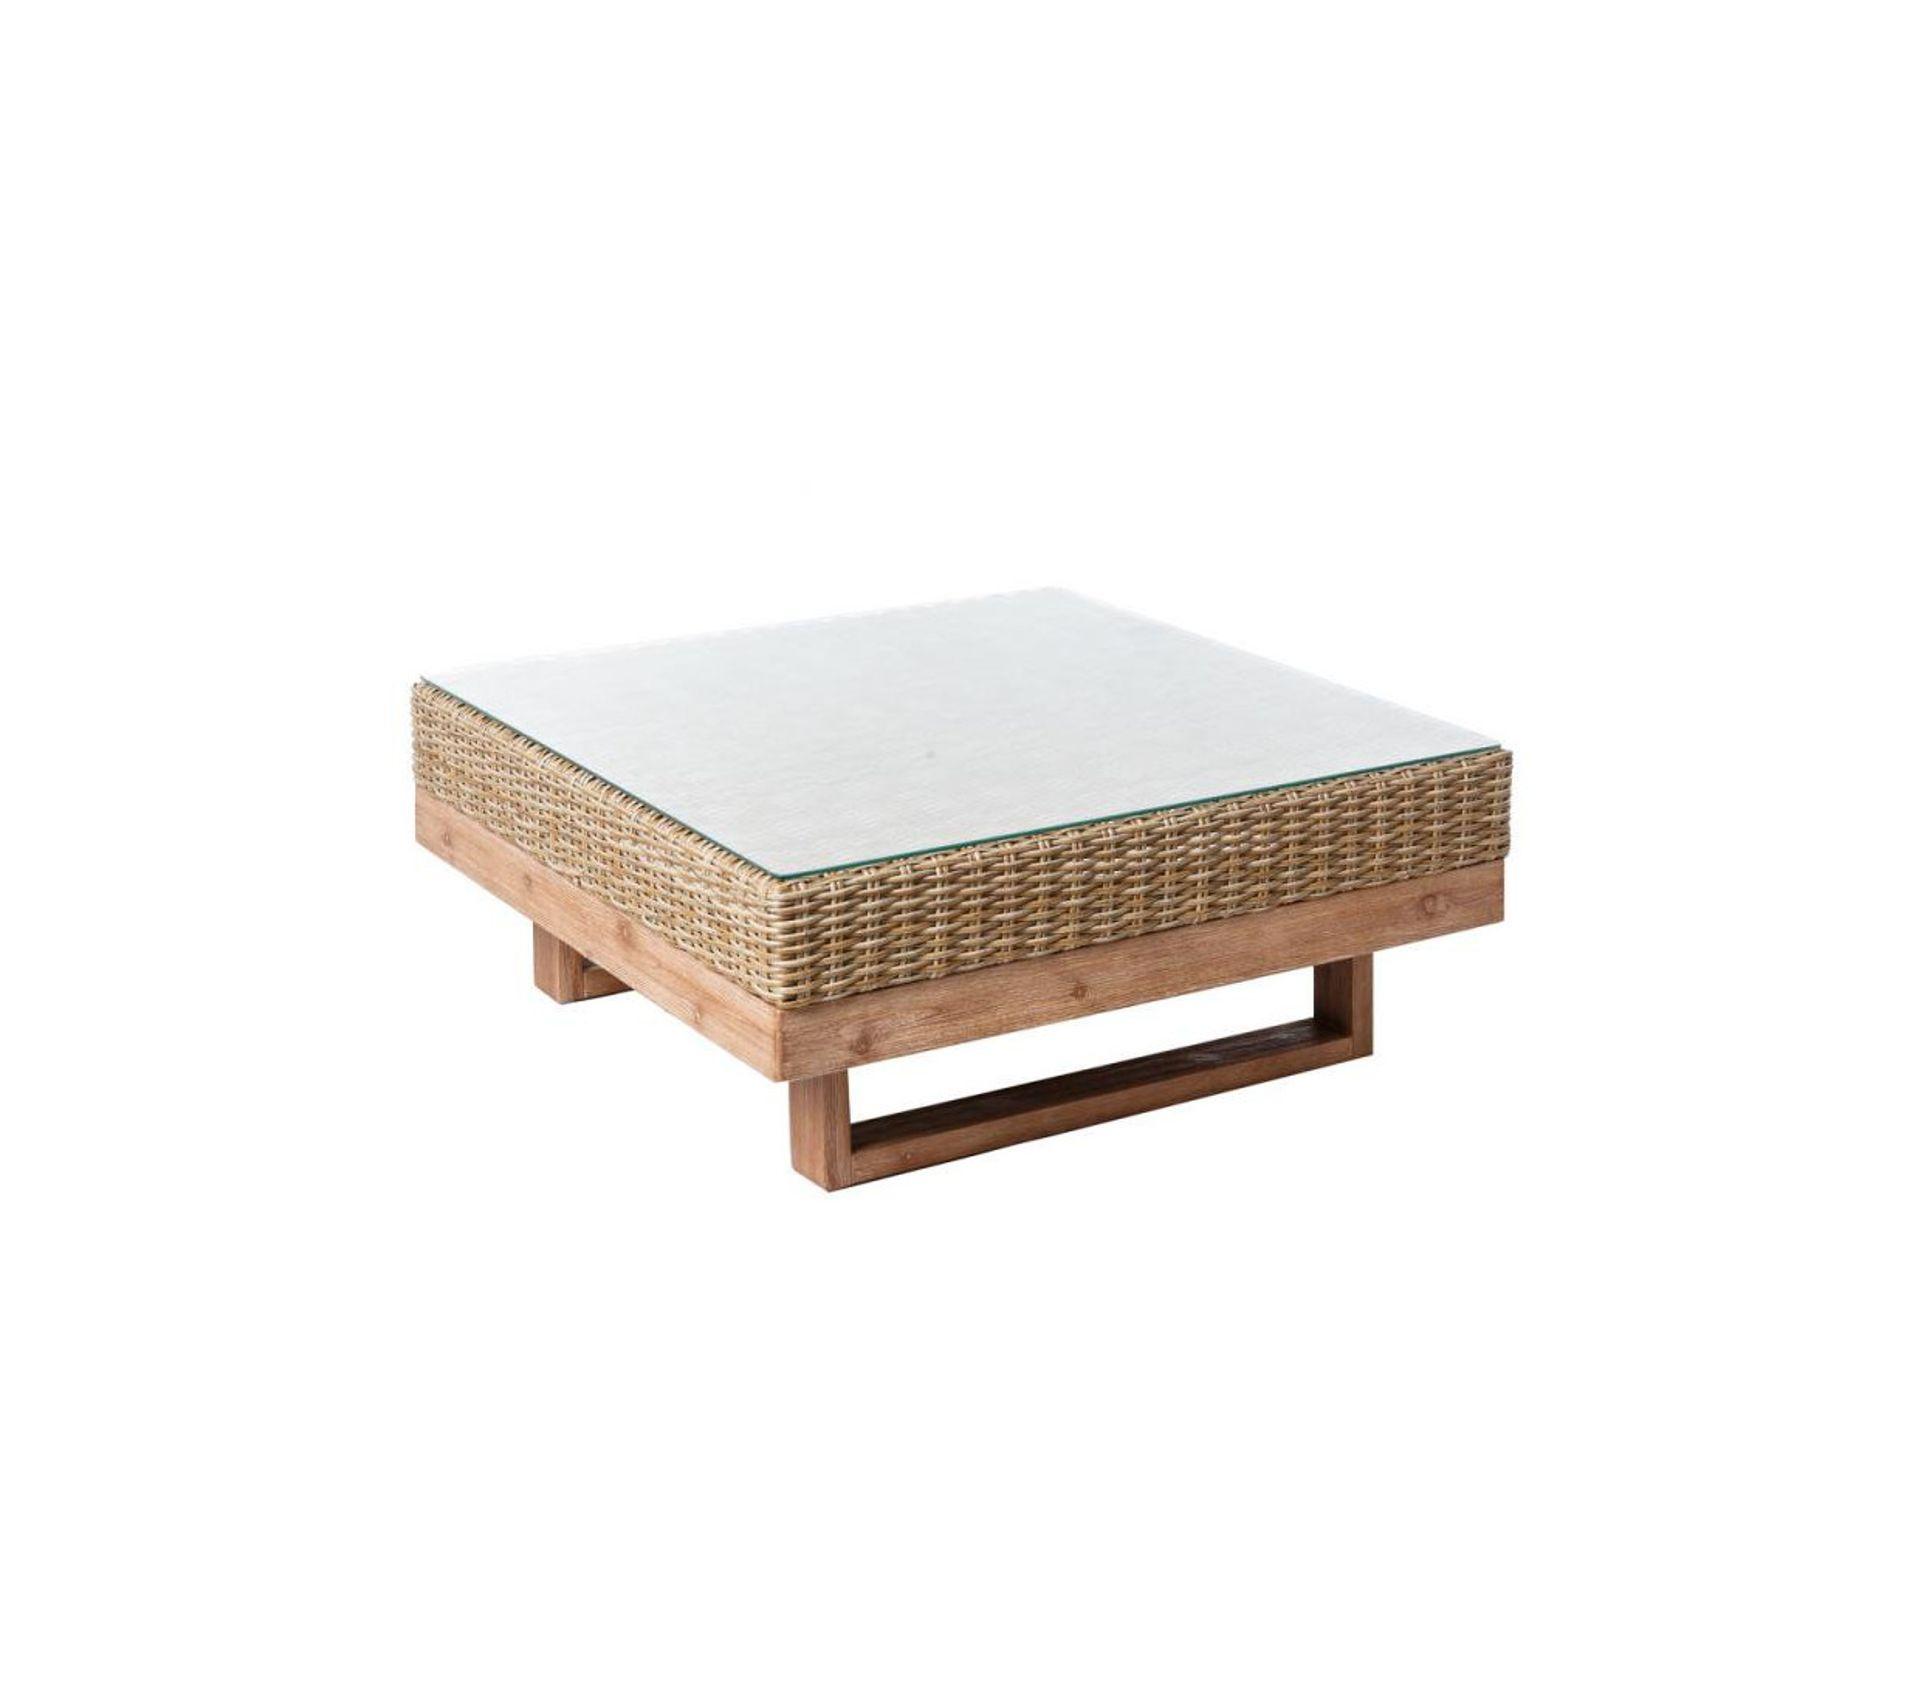 Table Basse D Exterieur Bois D Acacia Rotin Rinca Table Basse